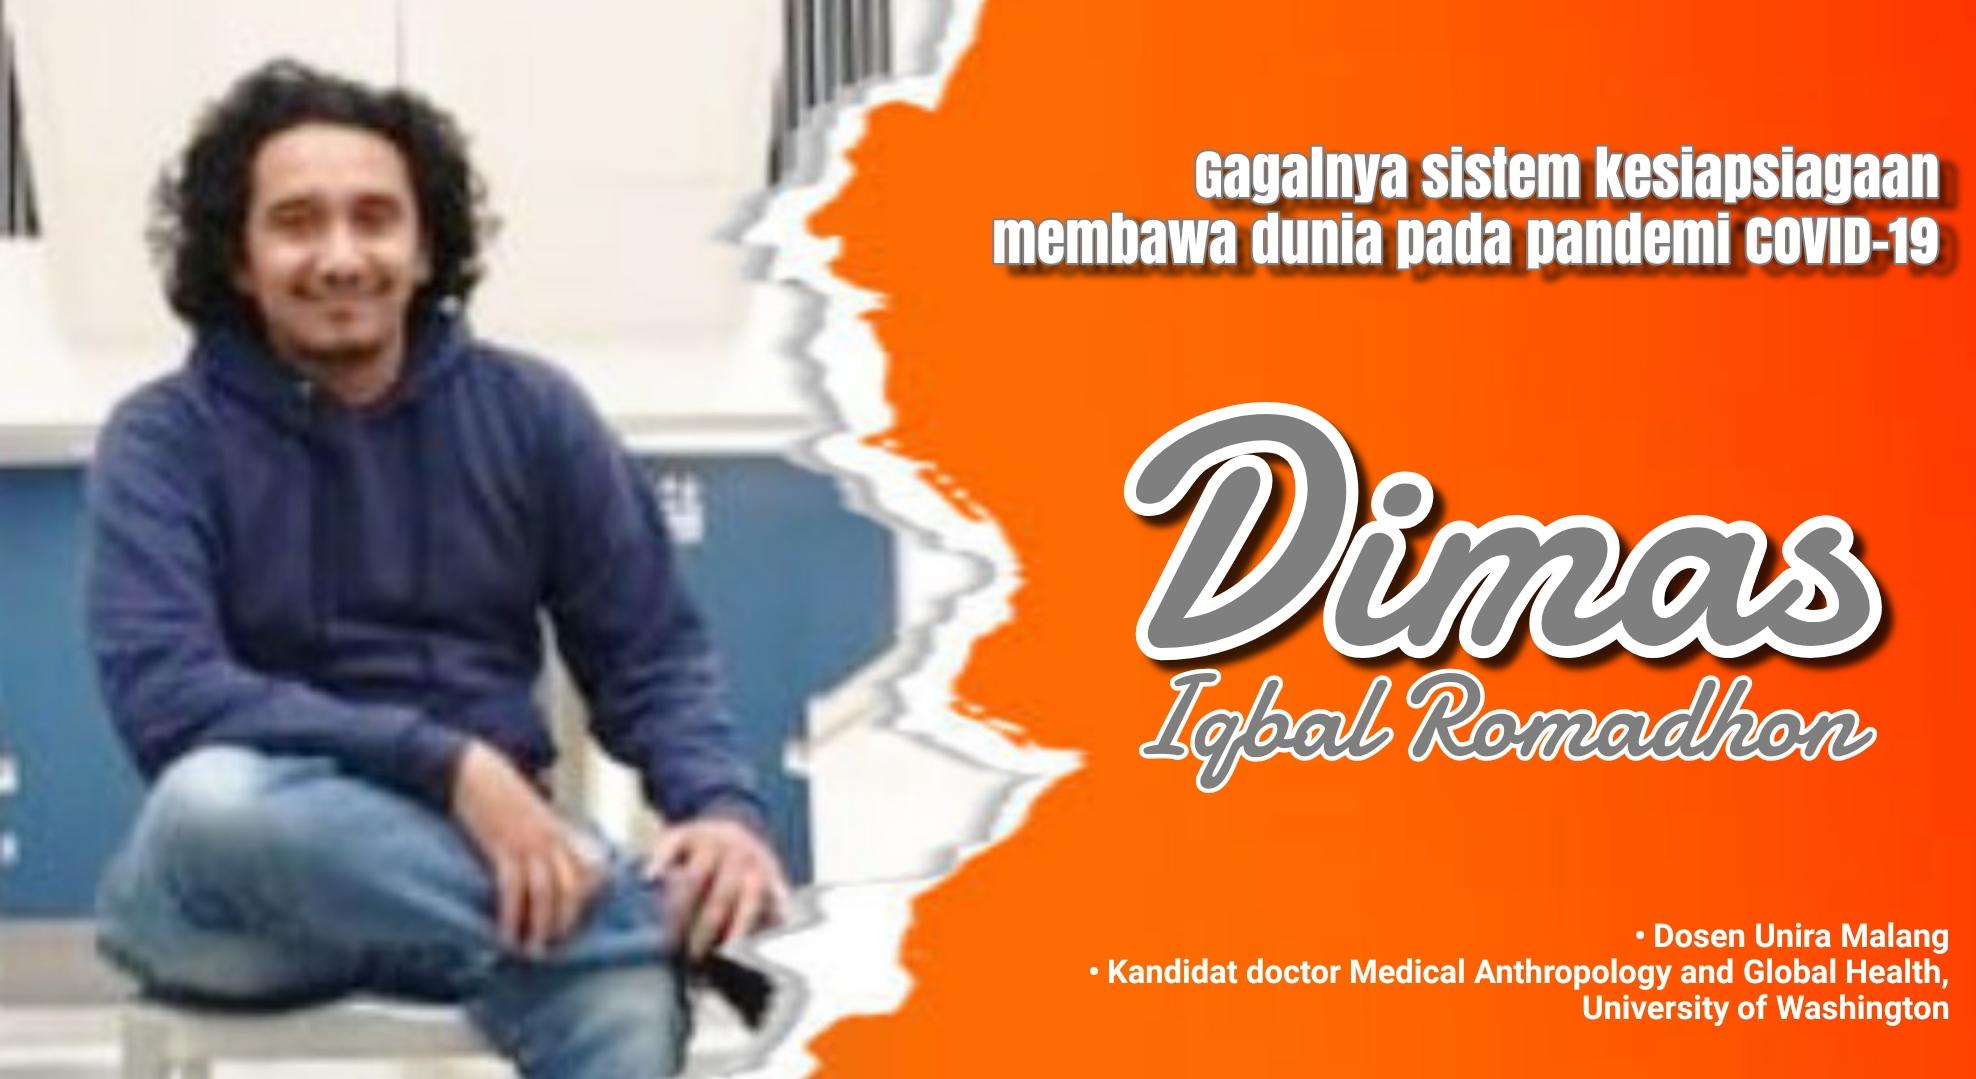 Foto : Dimas Iqbal Ramadlon, Dosen Unira Malang